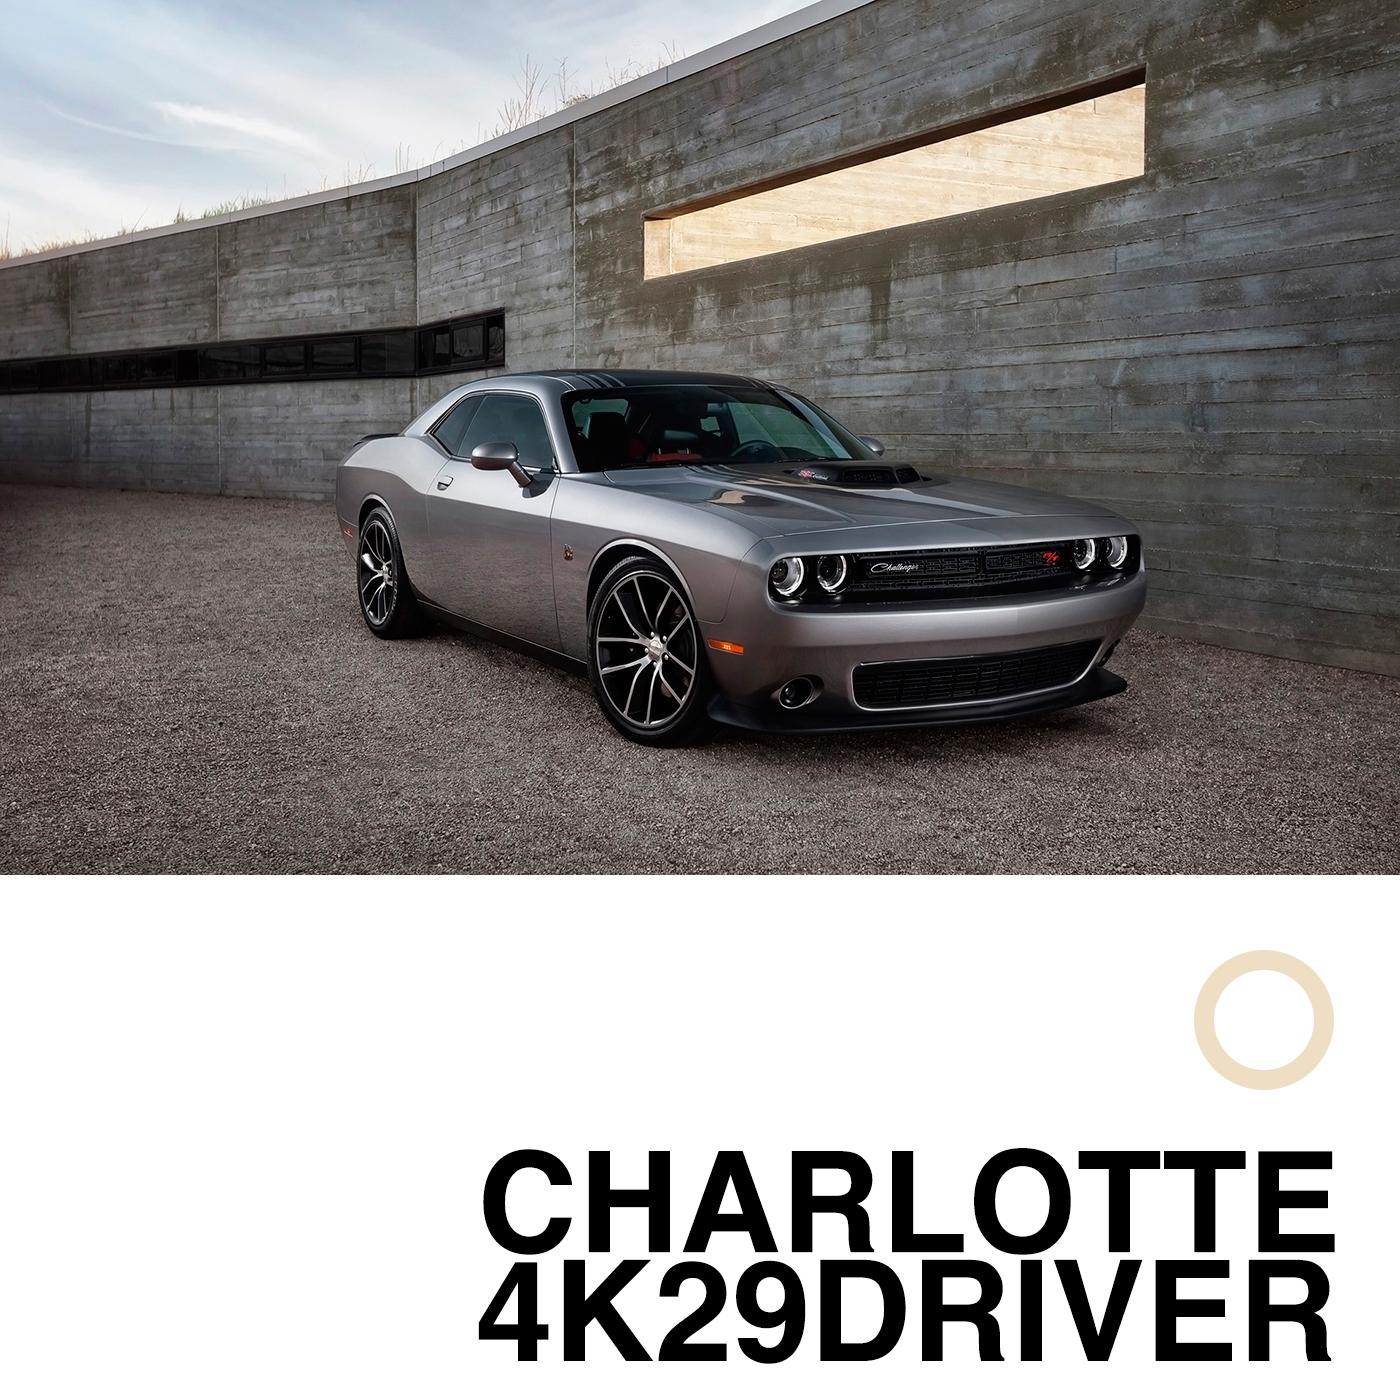 CHARLOTTE 4K29DRIVER MOBILE640